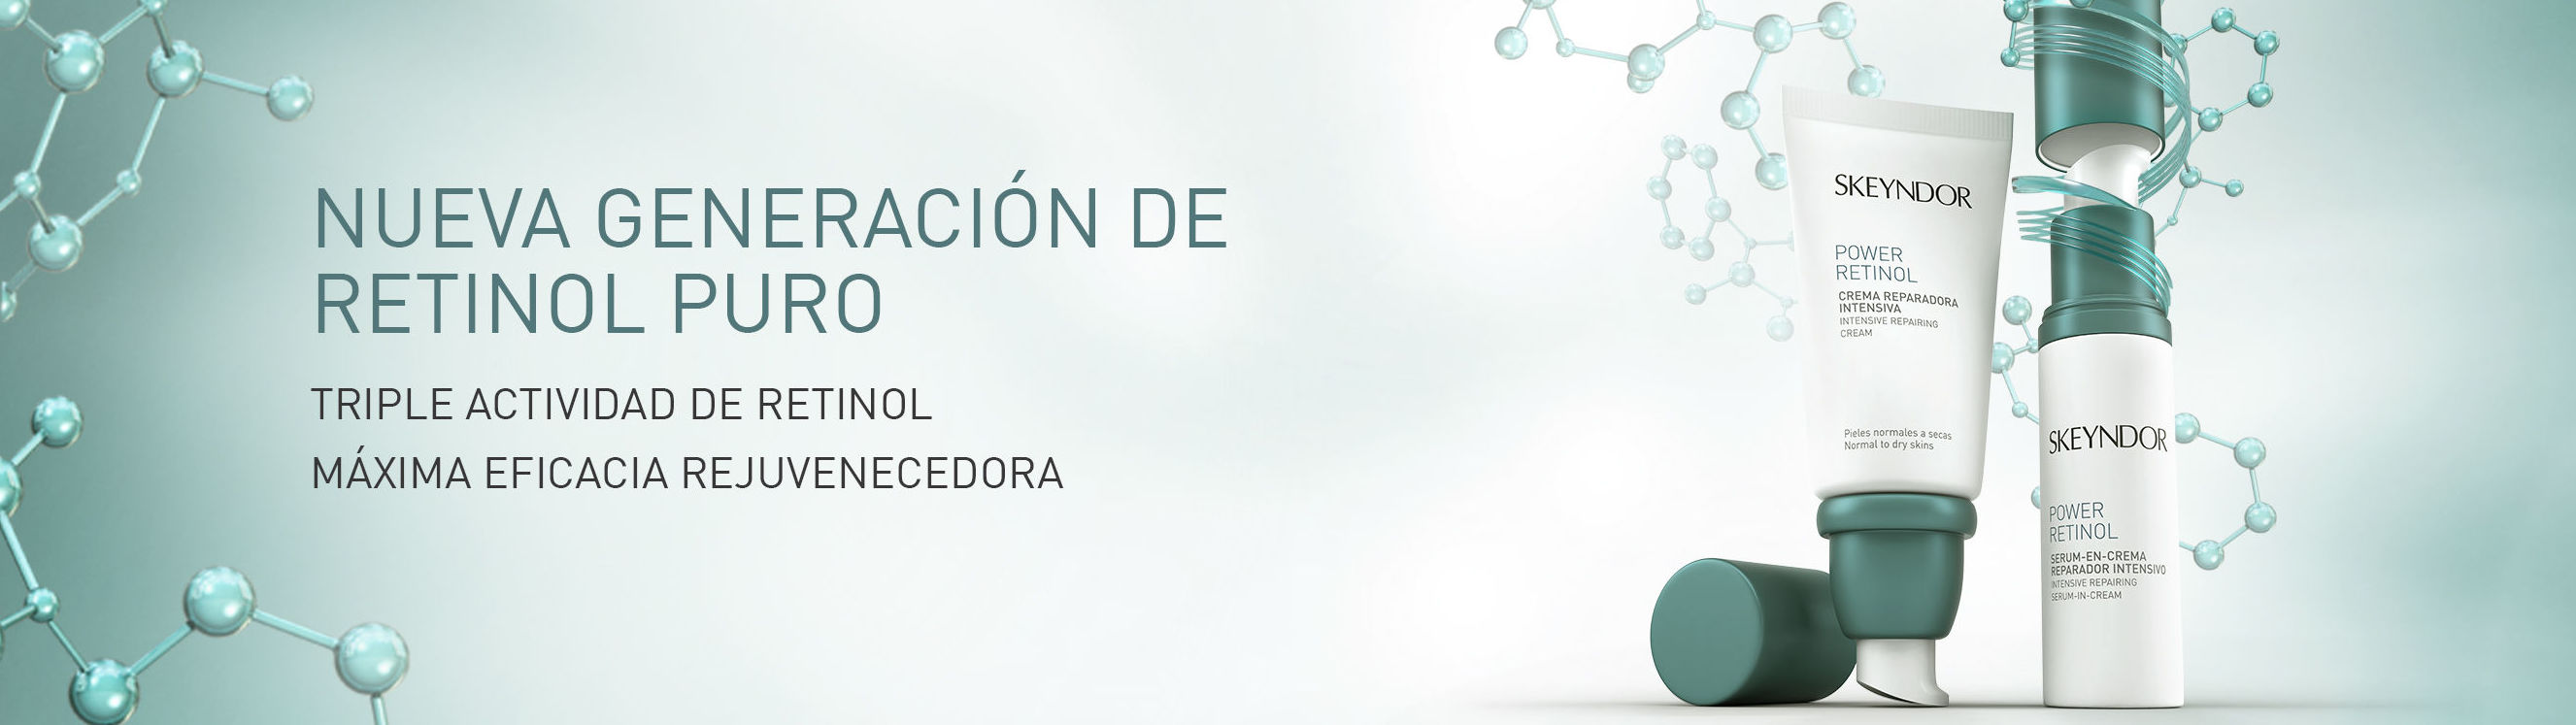 TRATAMIENTO FACIAL RETINOL: Servicios de Estetikk@ Alejandra Motta